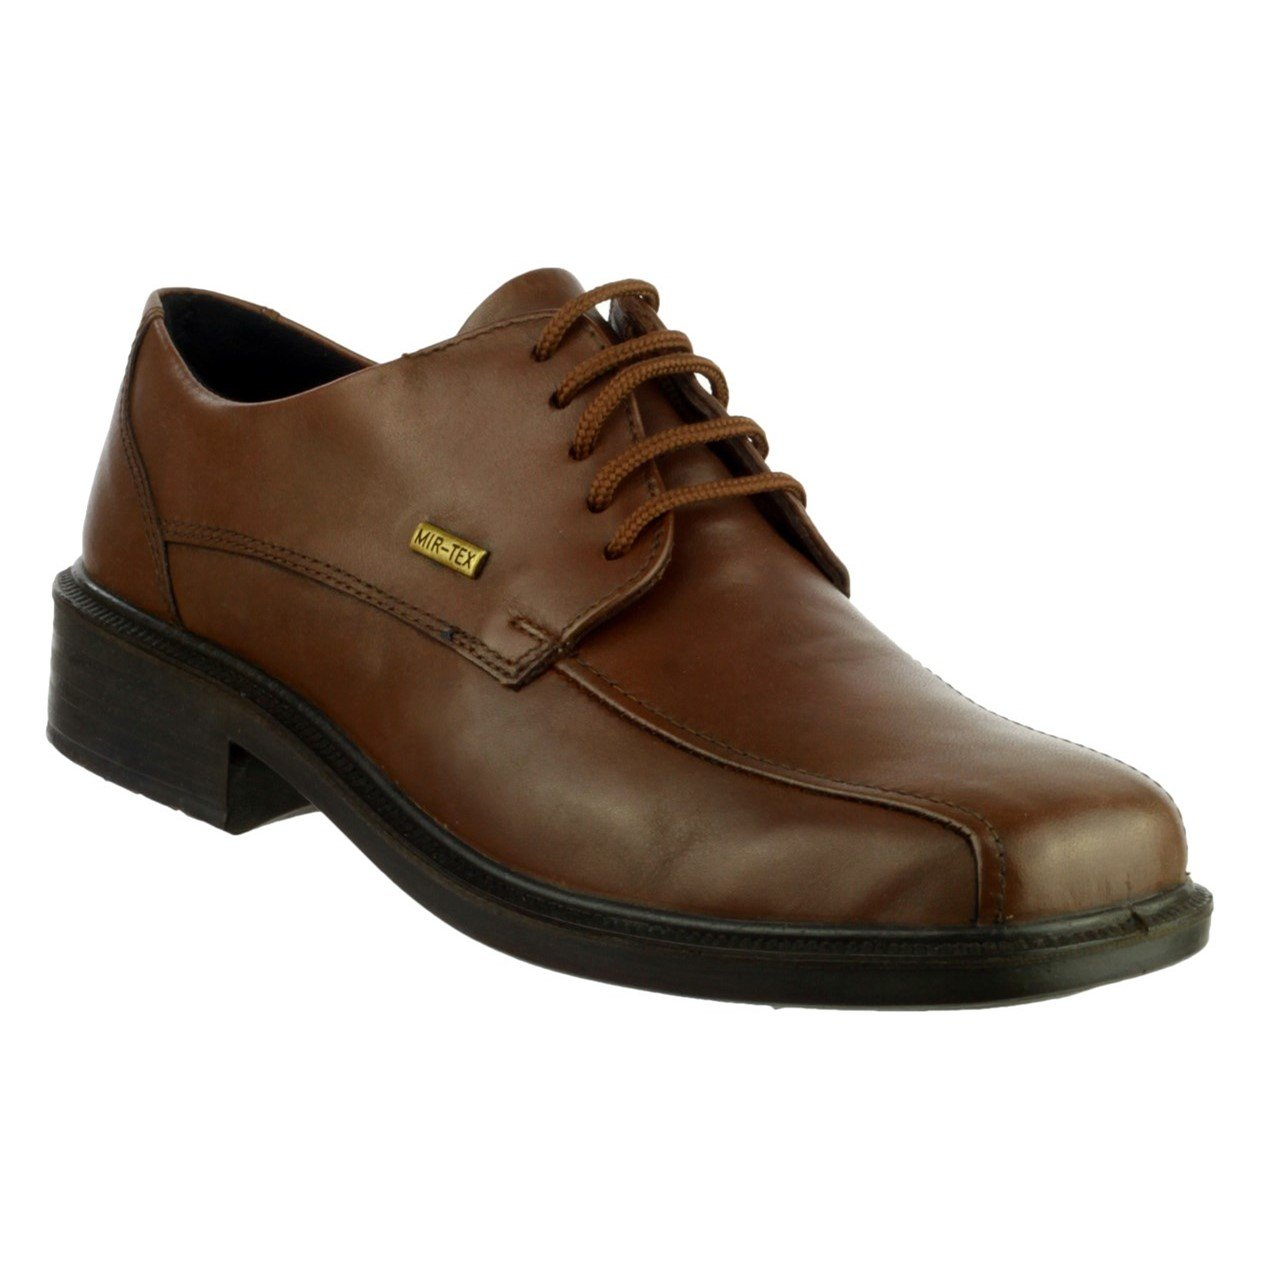 Cotswold Men's Stonehouse Waterproof Shoe Various Colours 32971 - Brown 9